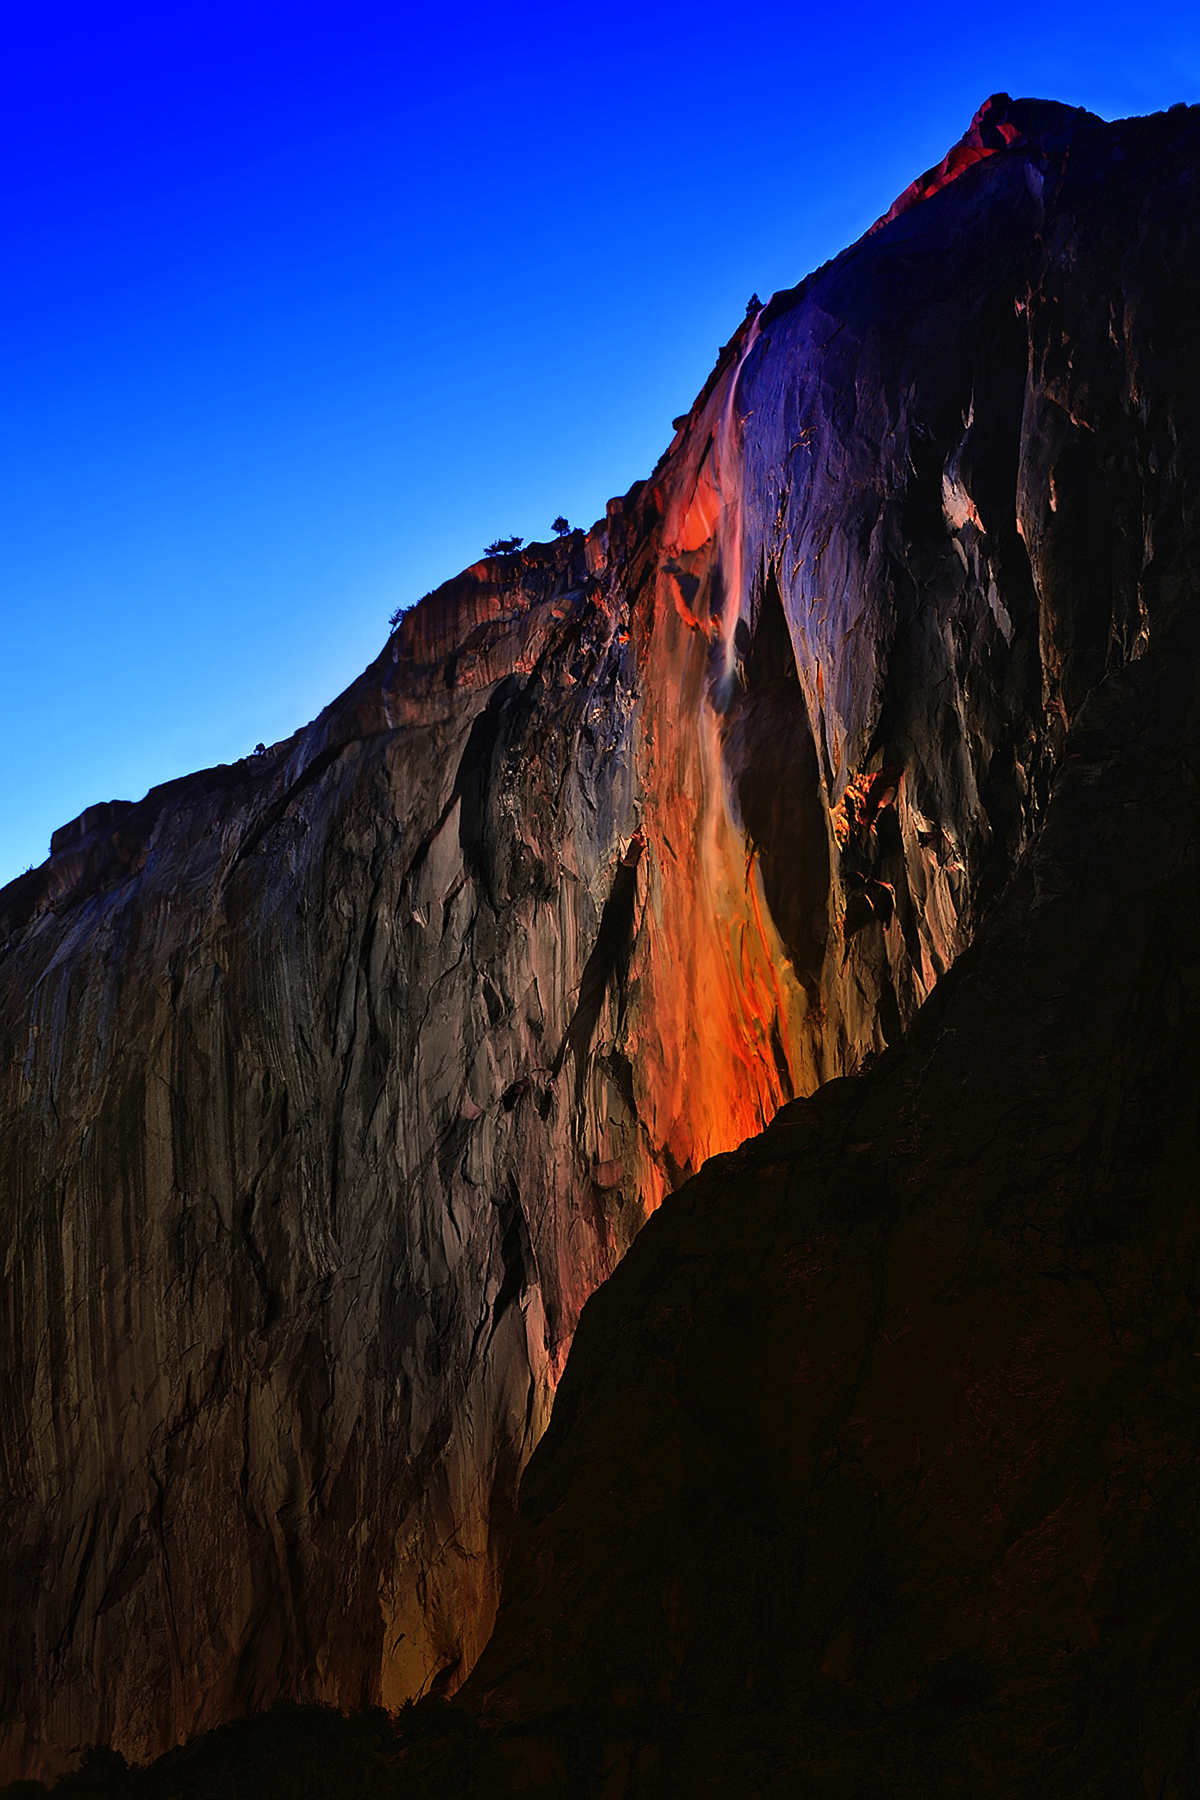 Horsetail-Falls-_4x6-300dpi_-Copyright-William-Roeser